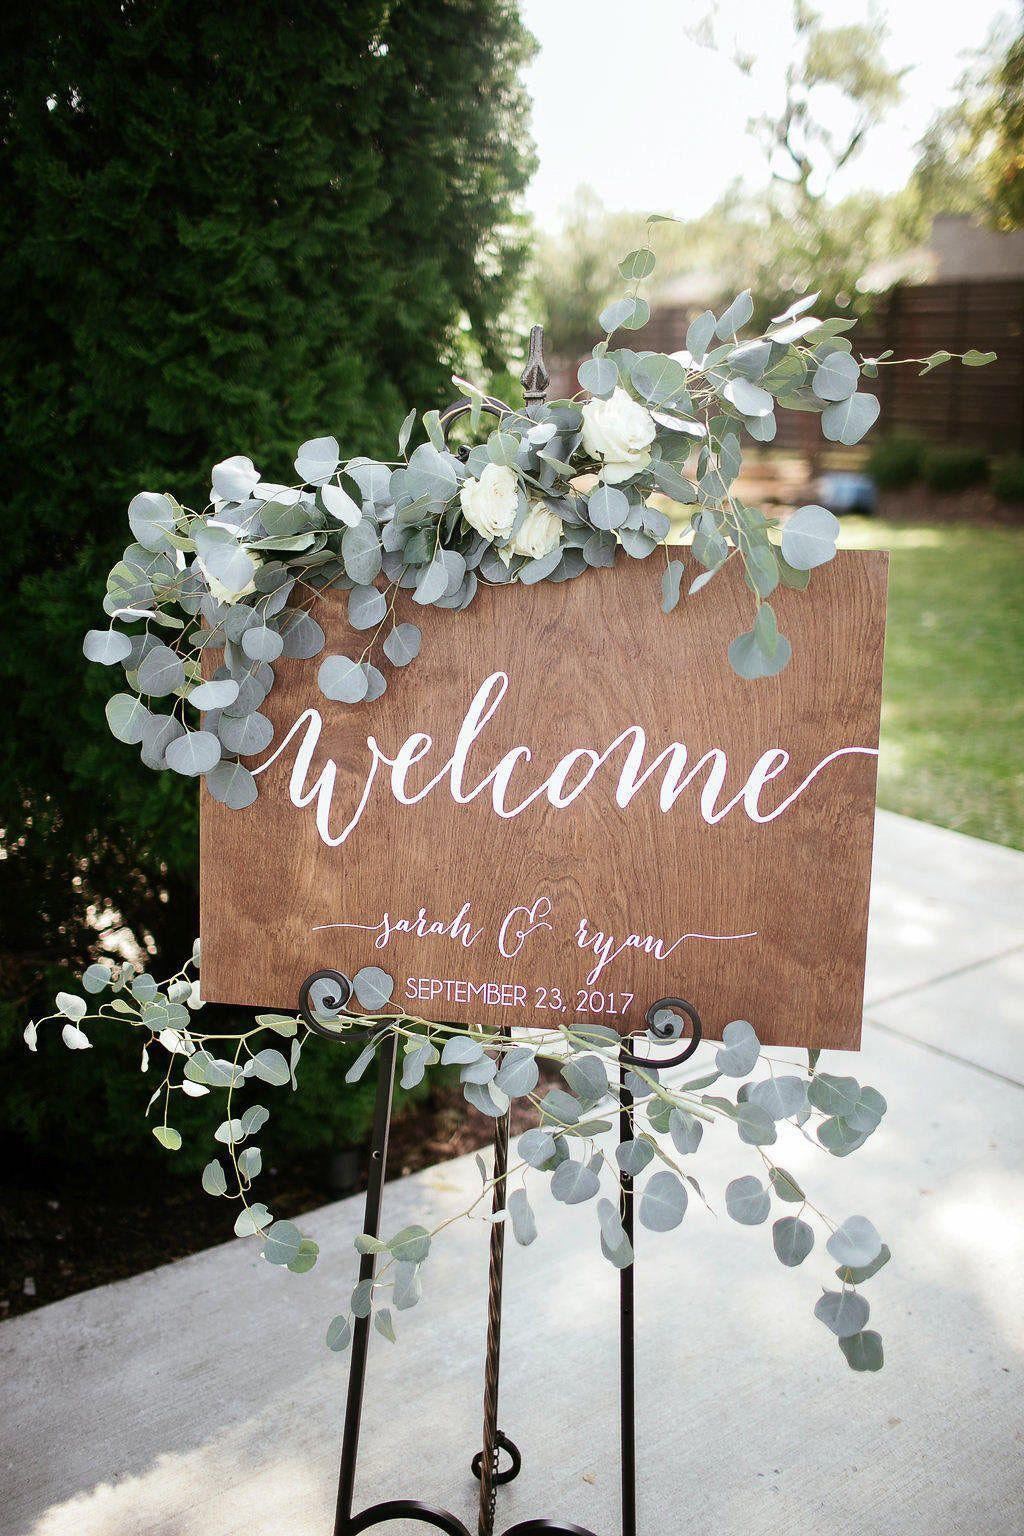 Wedding Welcome Sign, Welcome sign, Wedding Wood Welcome Sign, Wedding sign, Wood Wedding Sign, Wooden Wedding Sign, Wood, Rustic wed ww1 -c